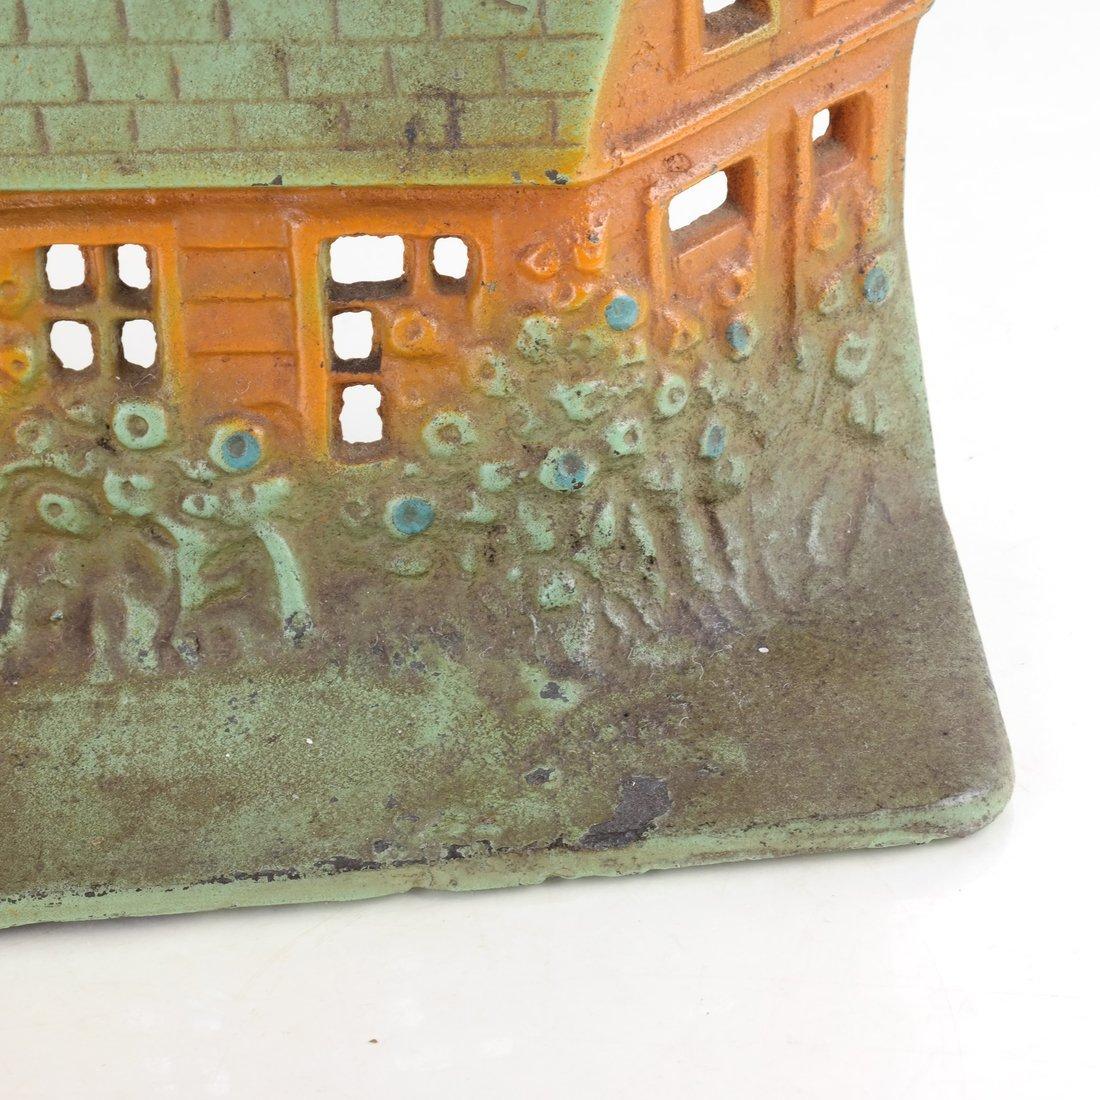 Painted Cast Iron Cottage Doorstop - 9